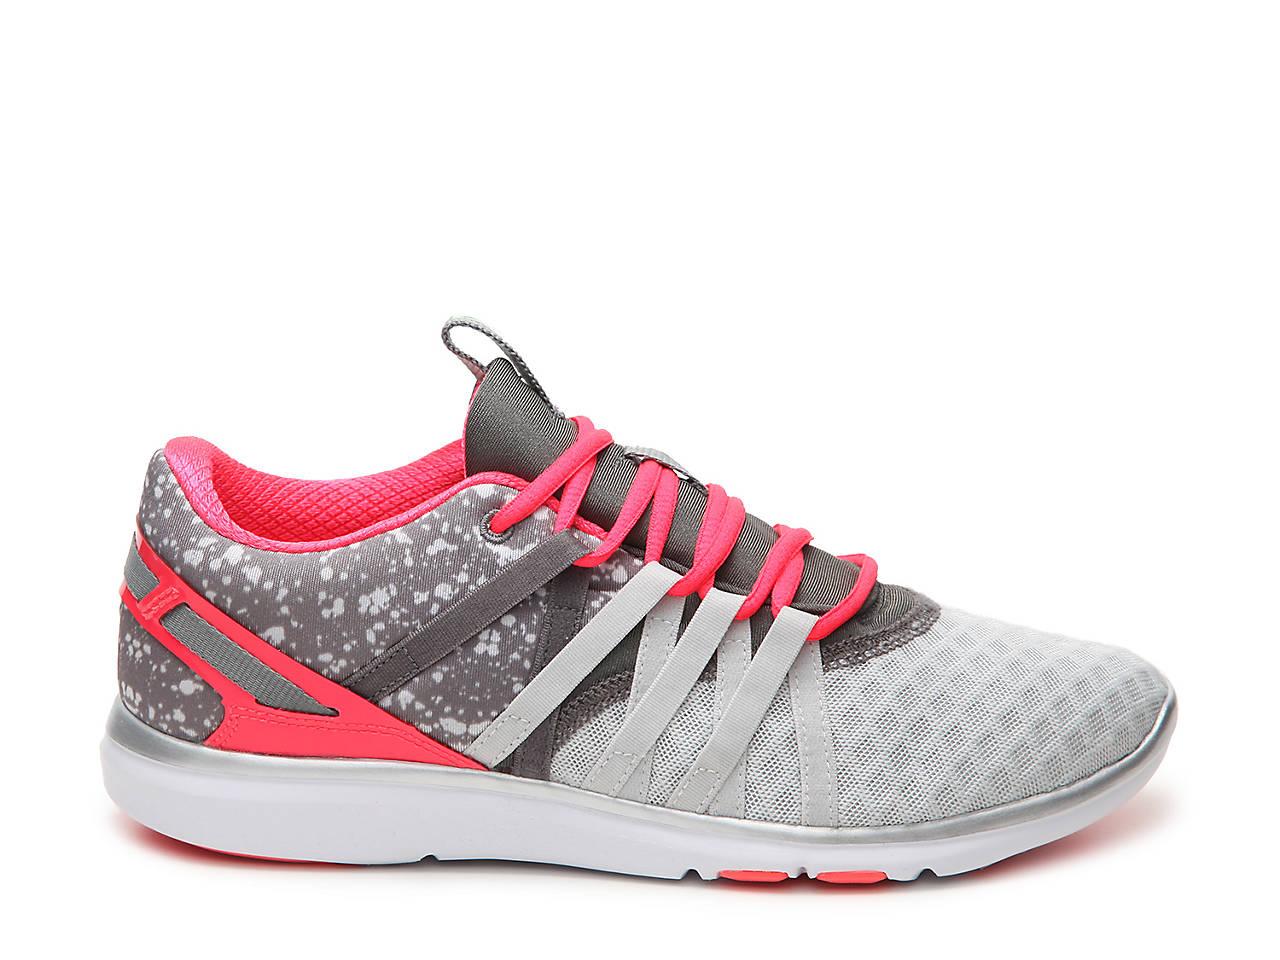 GEL Fit Yui Training Shoe - Women's. previous next